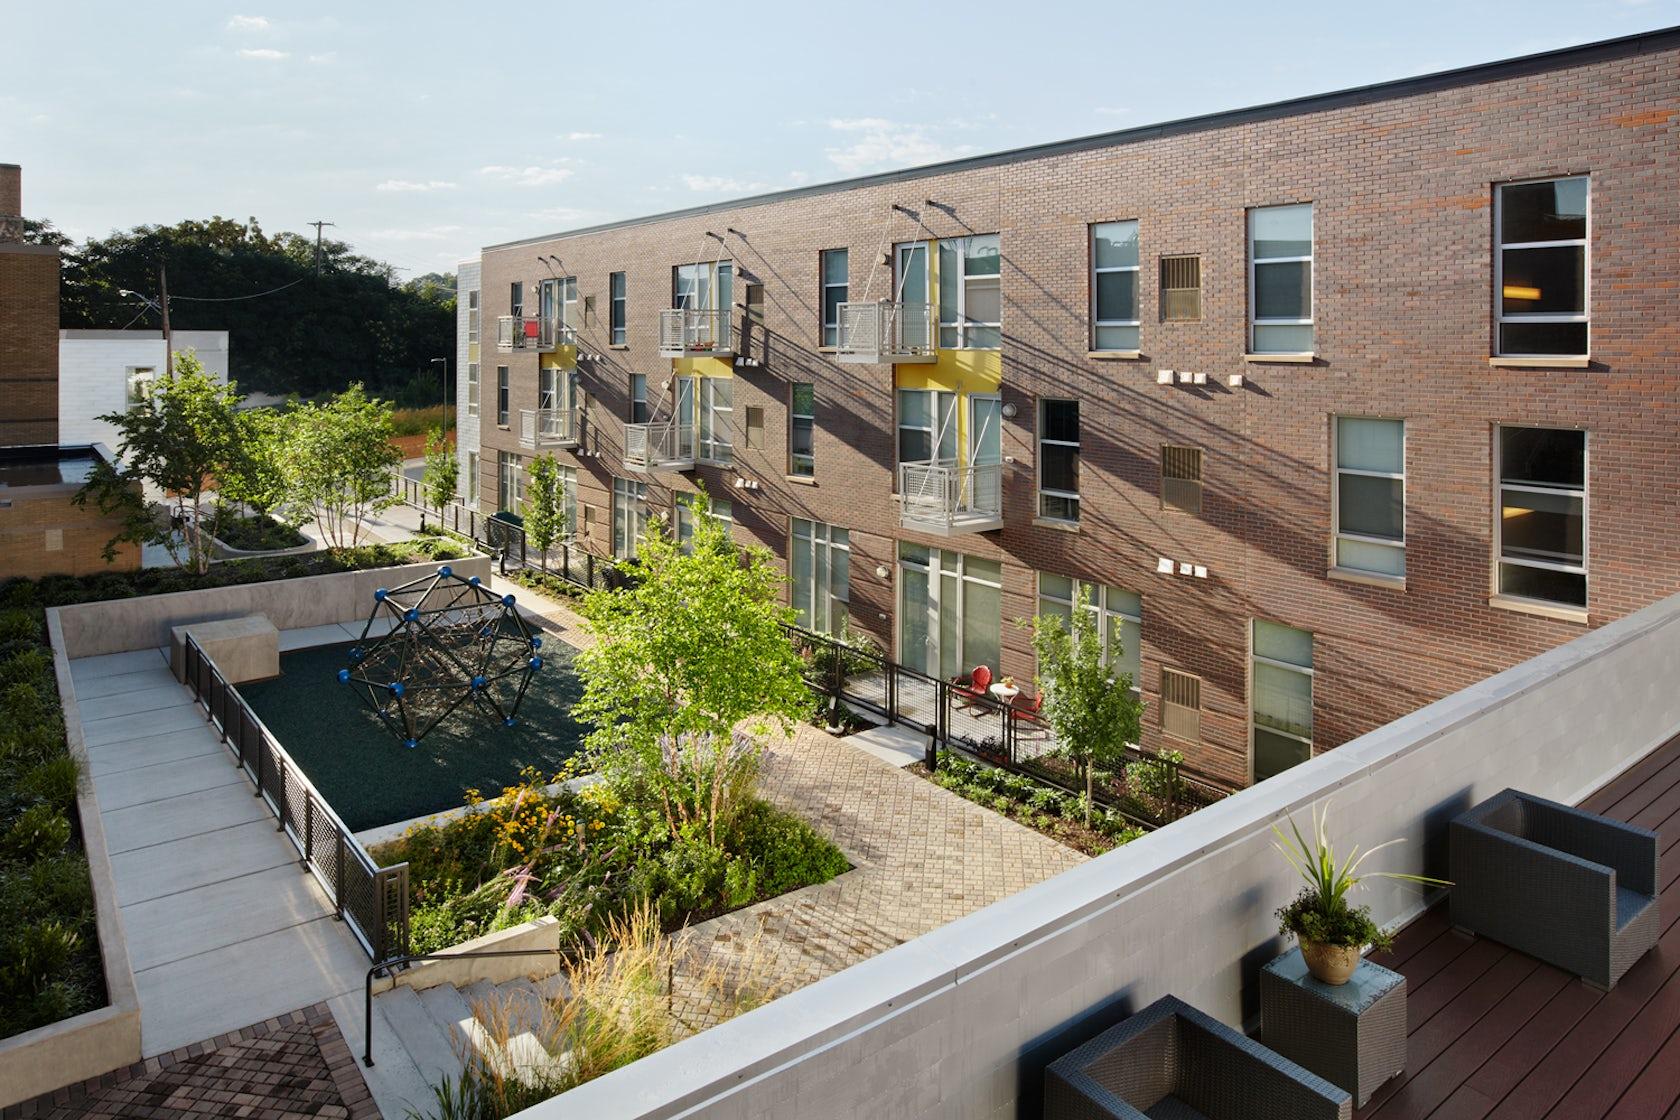 Elgin Artspace Lofts on Architizer